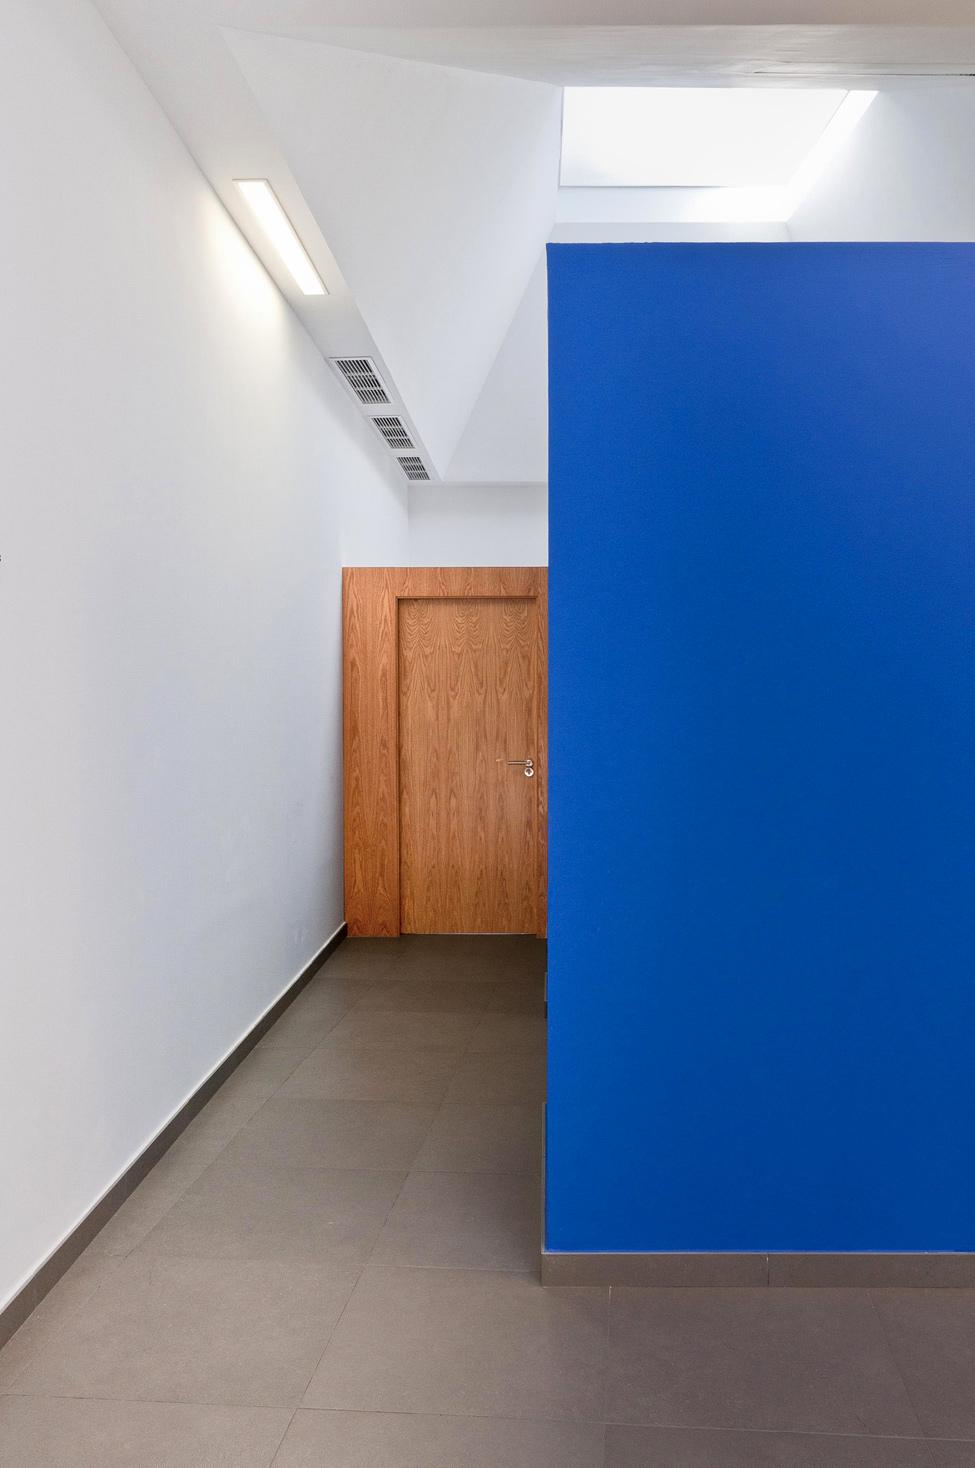 http://www.aljalawi.net/wp-content/uploads/2012/07/estudiolamazeta_hqroom_ru_7.jpg